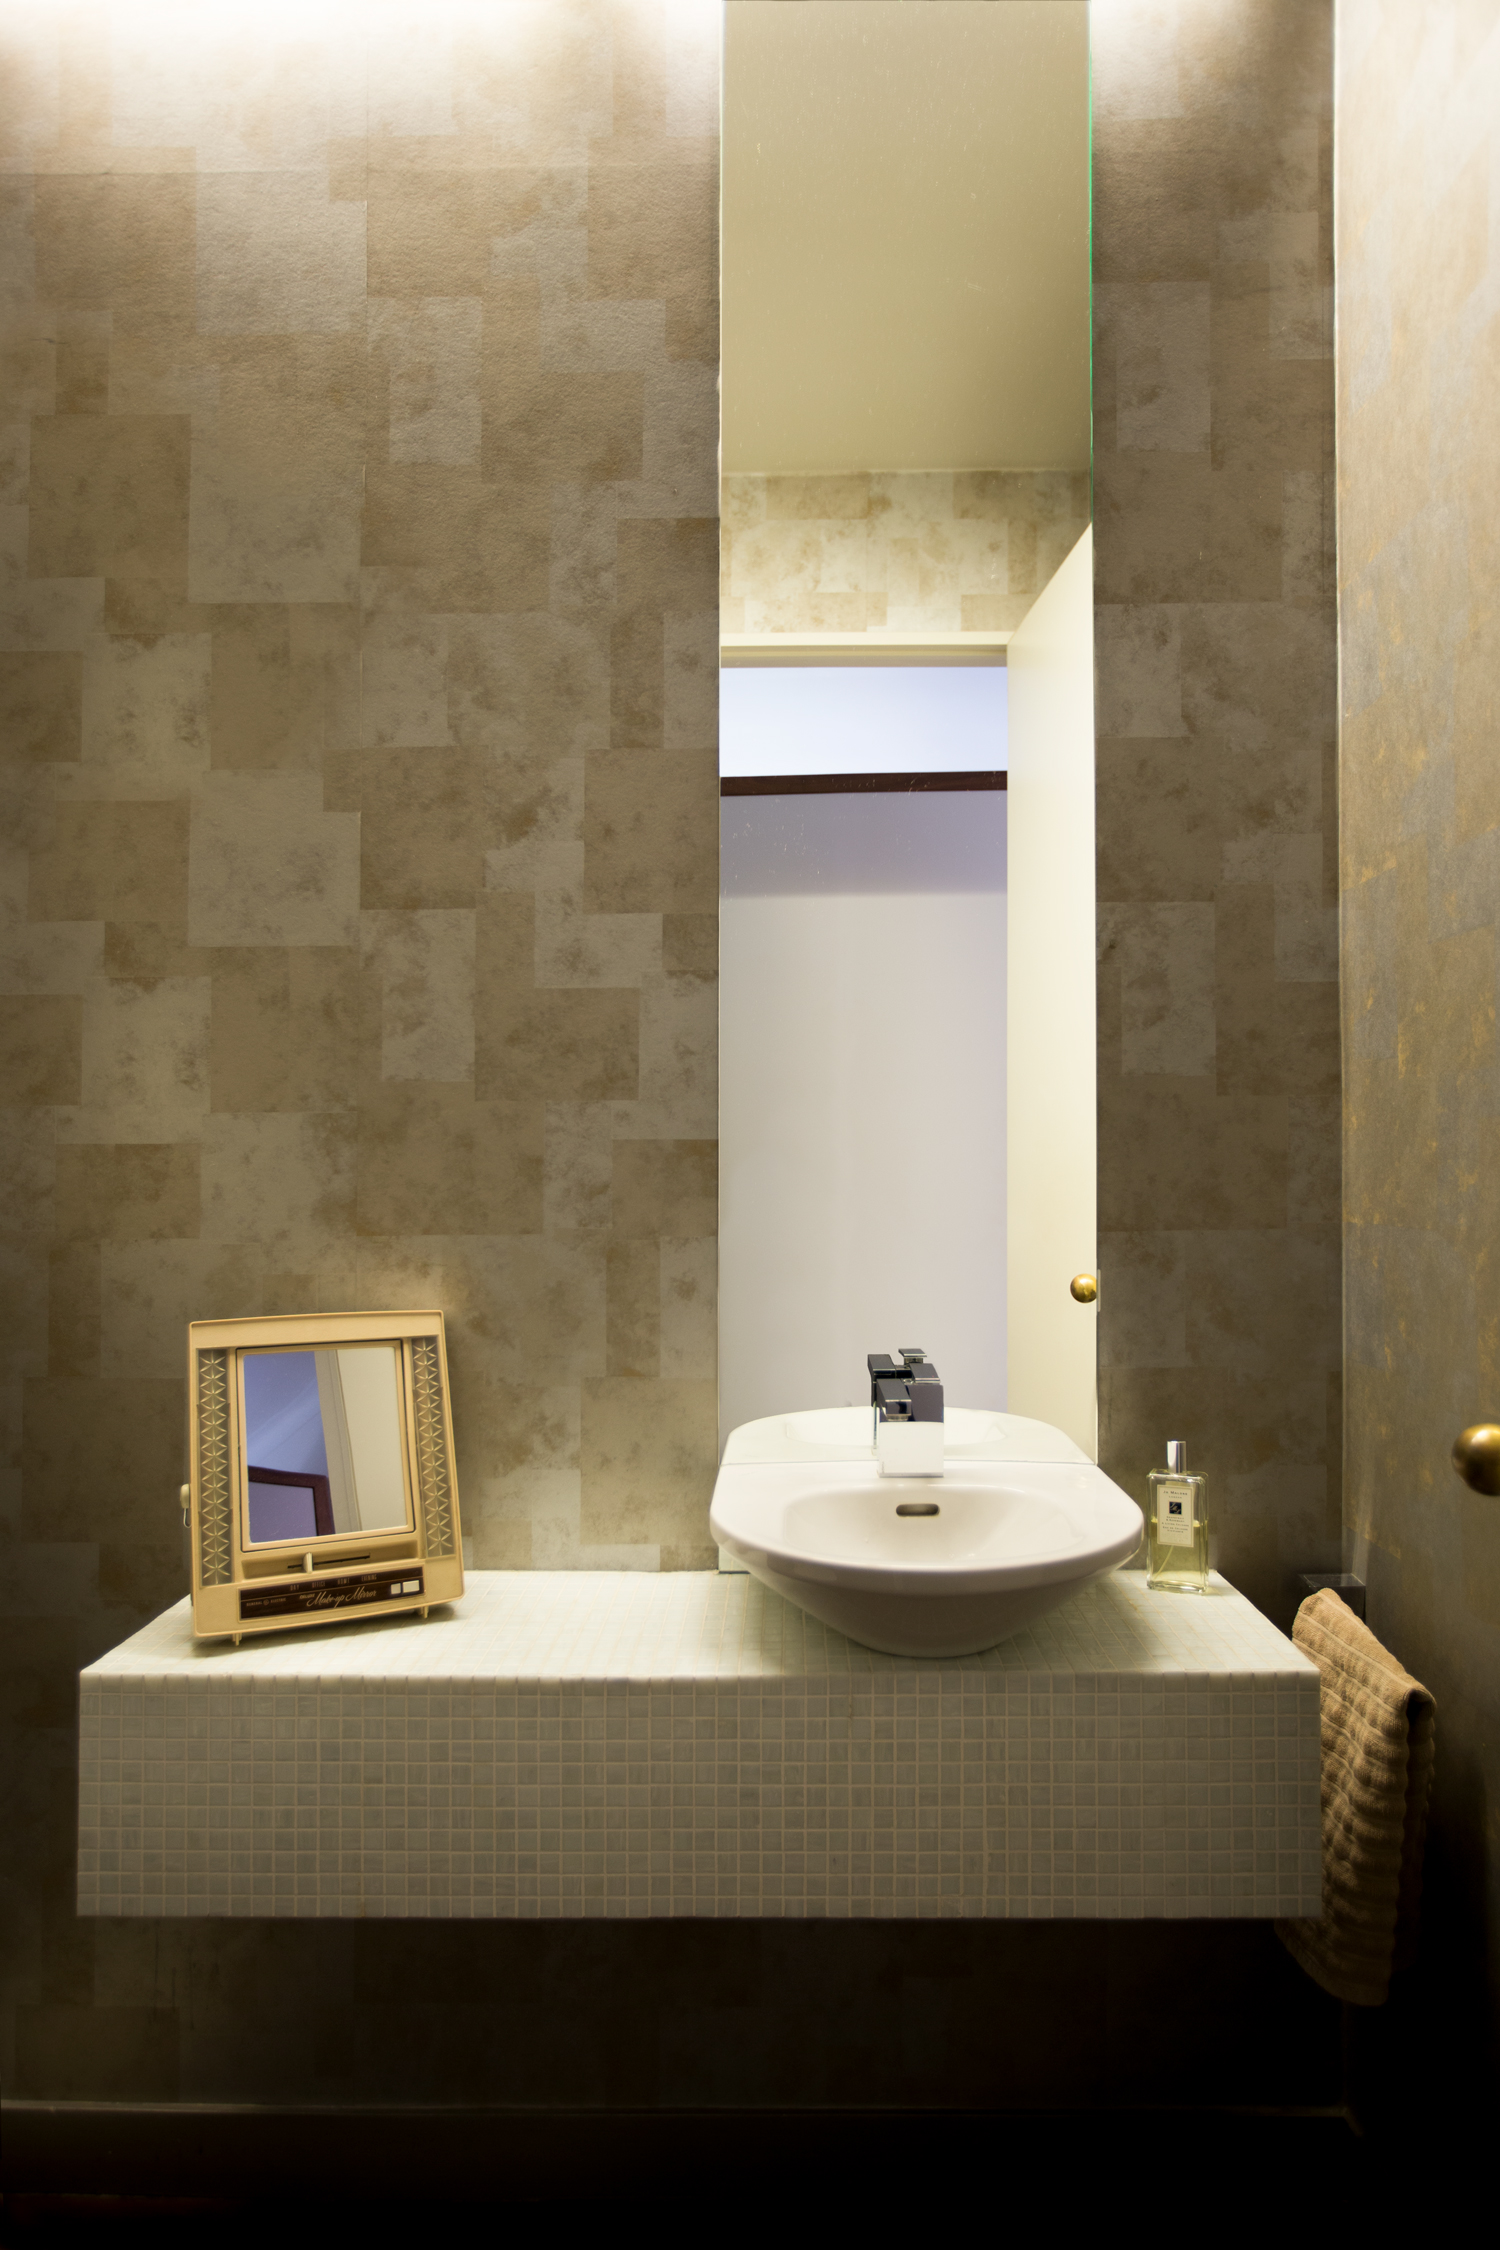 Bathroom goals (photo by Jenna Smith)